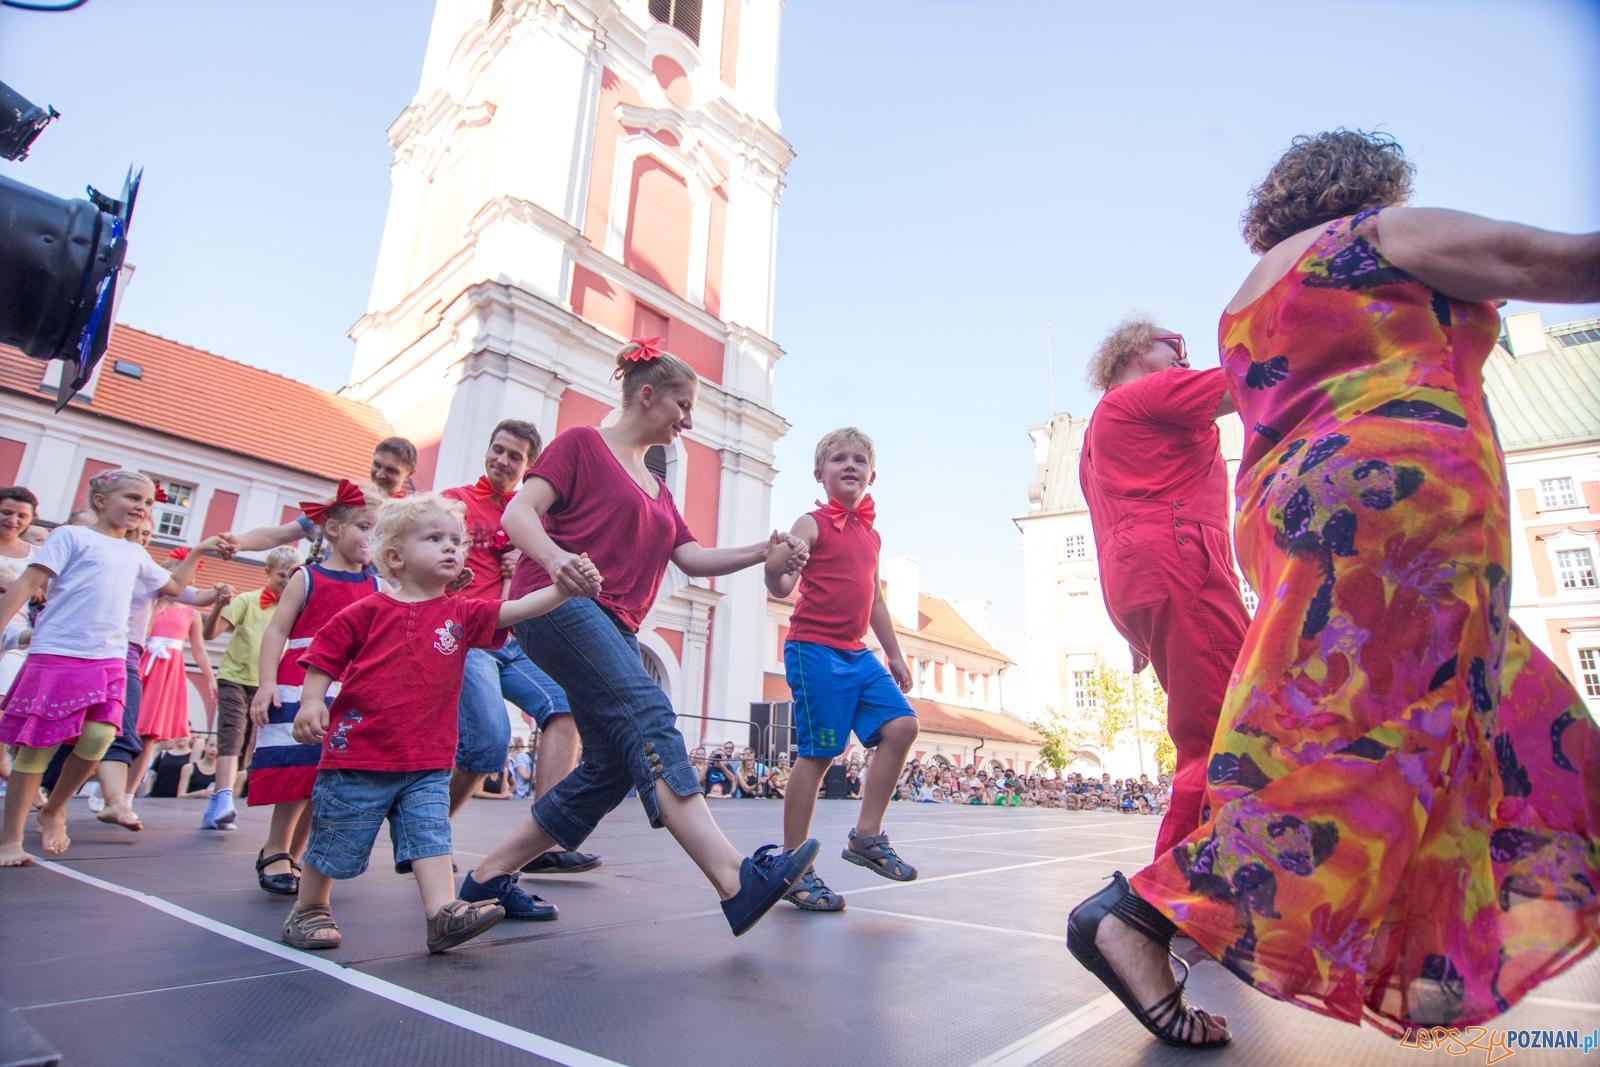 Dancing Poznan 2015  Foto: lepszyPOZNAN.pl / Piotr Rychter